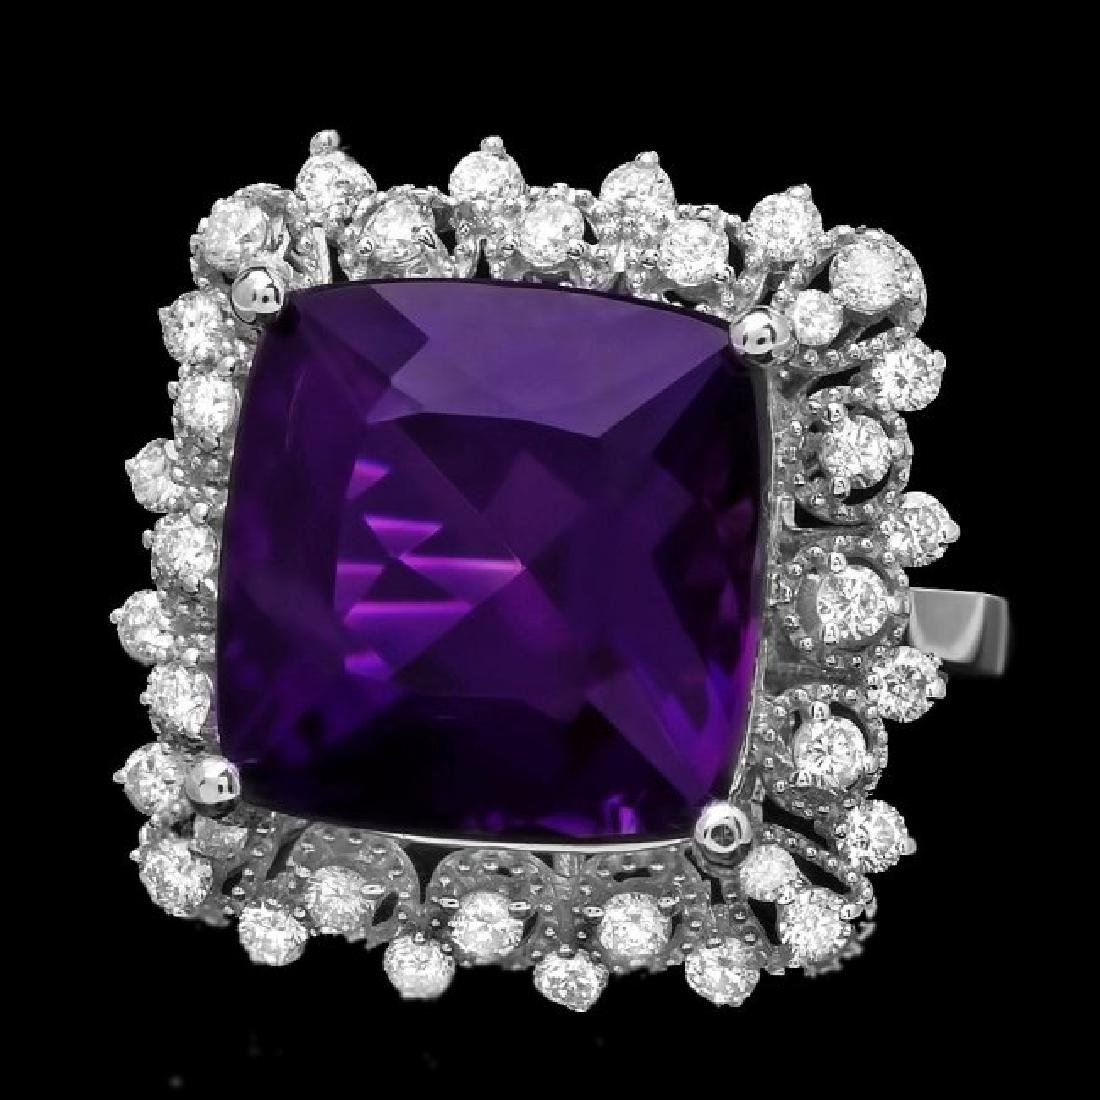 14k Gold 9.70ct Amethyst 0.80ct Diamond Ring